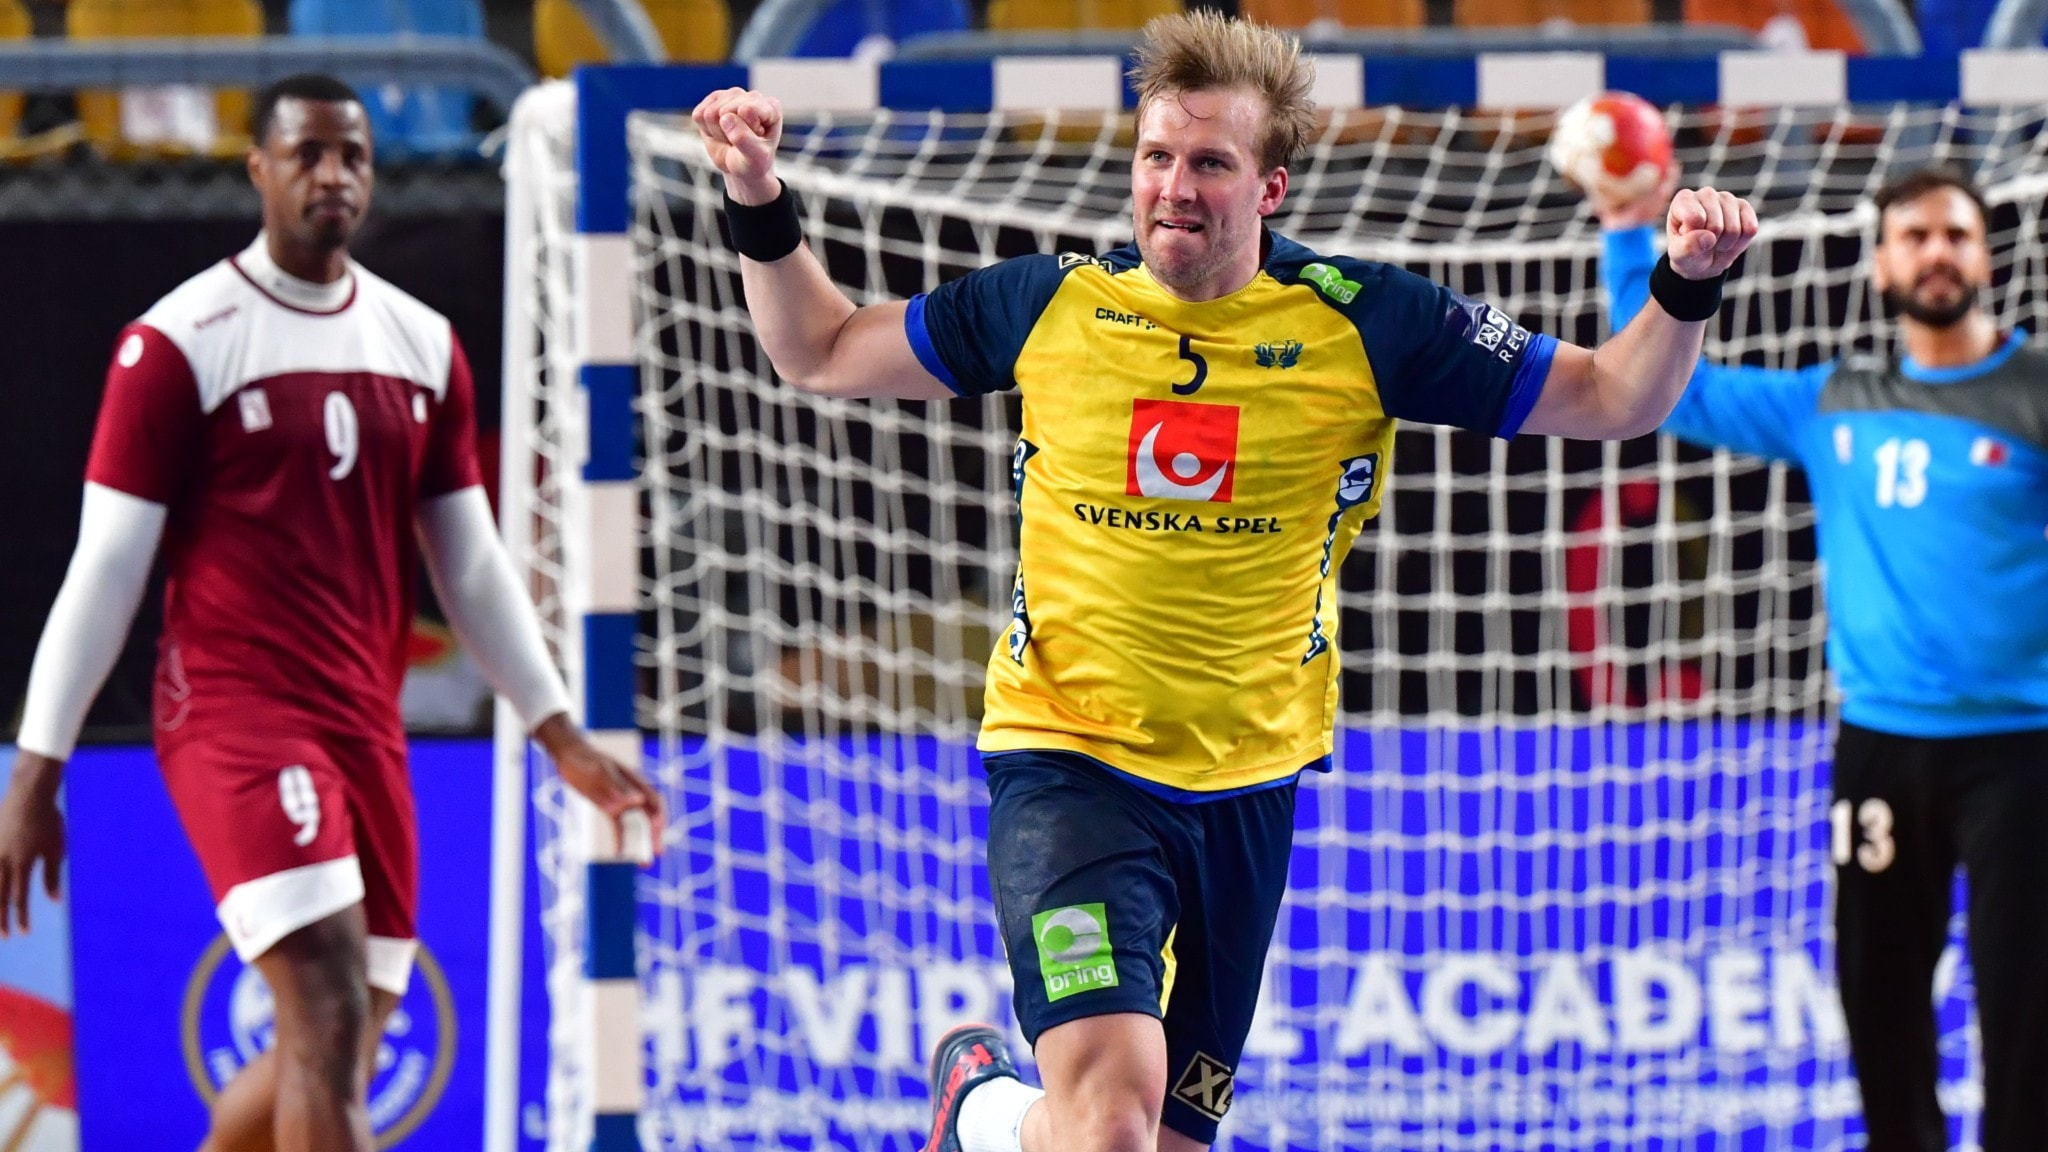 A swedish handball player.